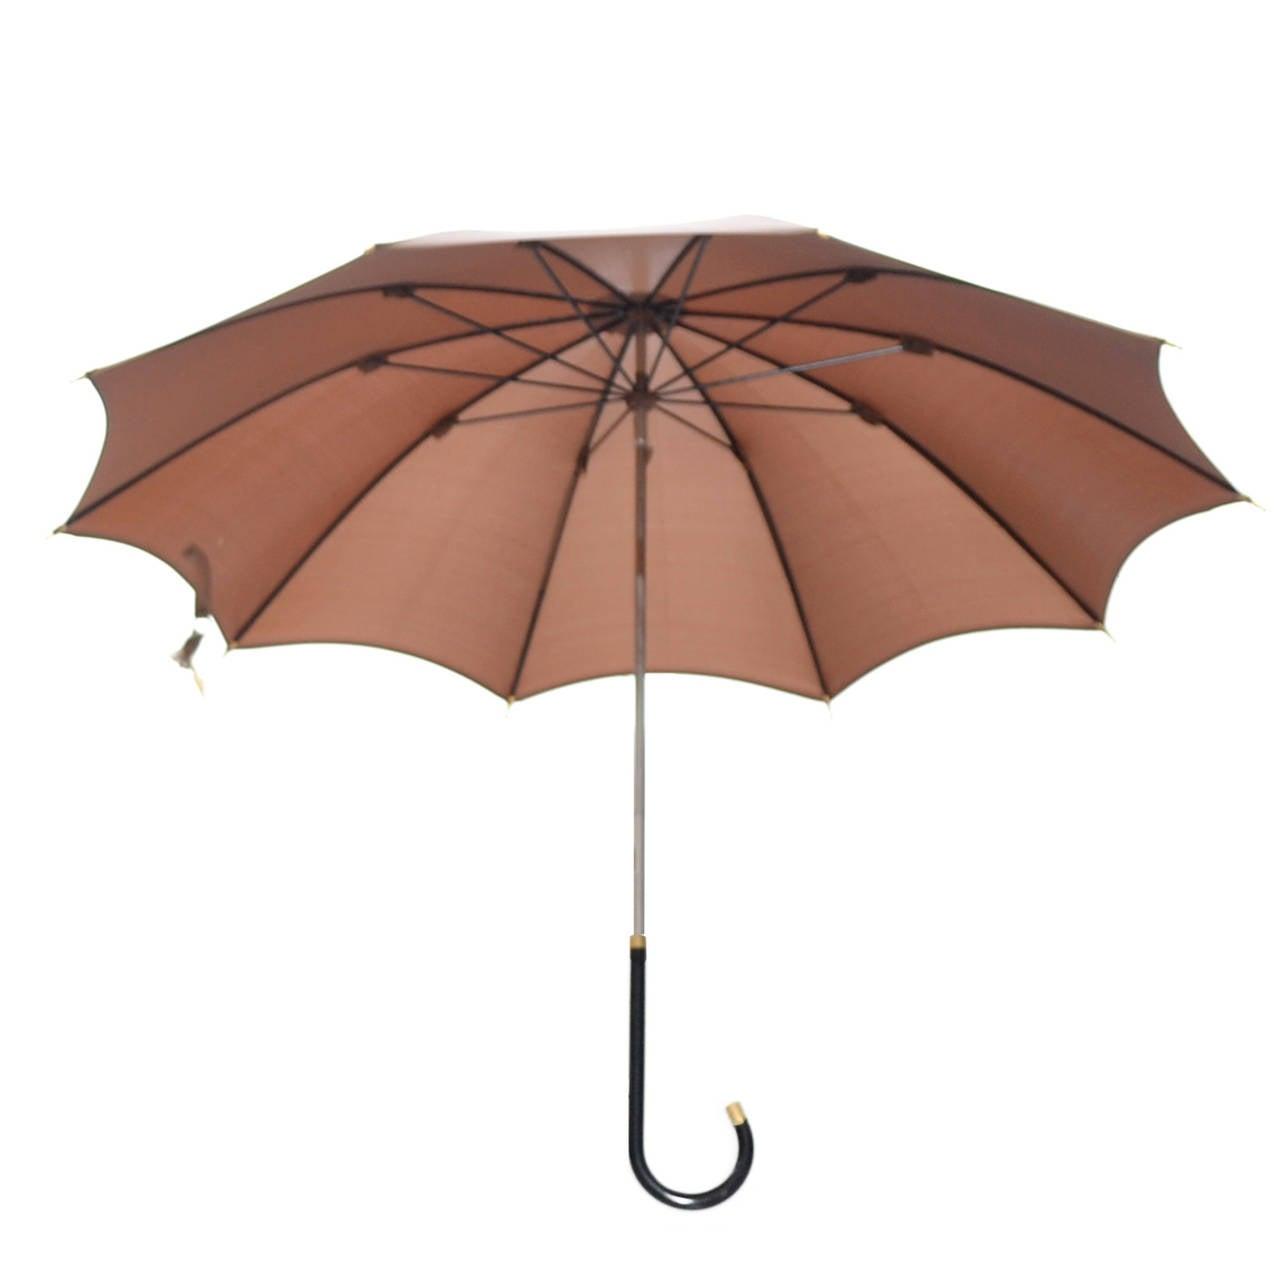 Dead Stock New Vintage Gucci Umbrella 1970s Brown Italy 4